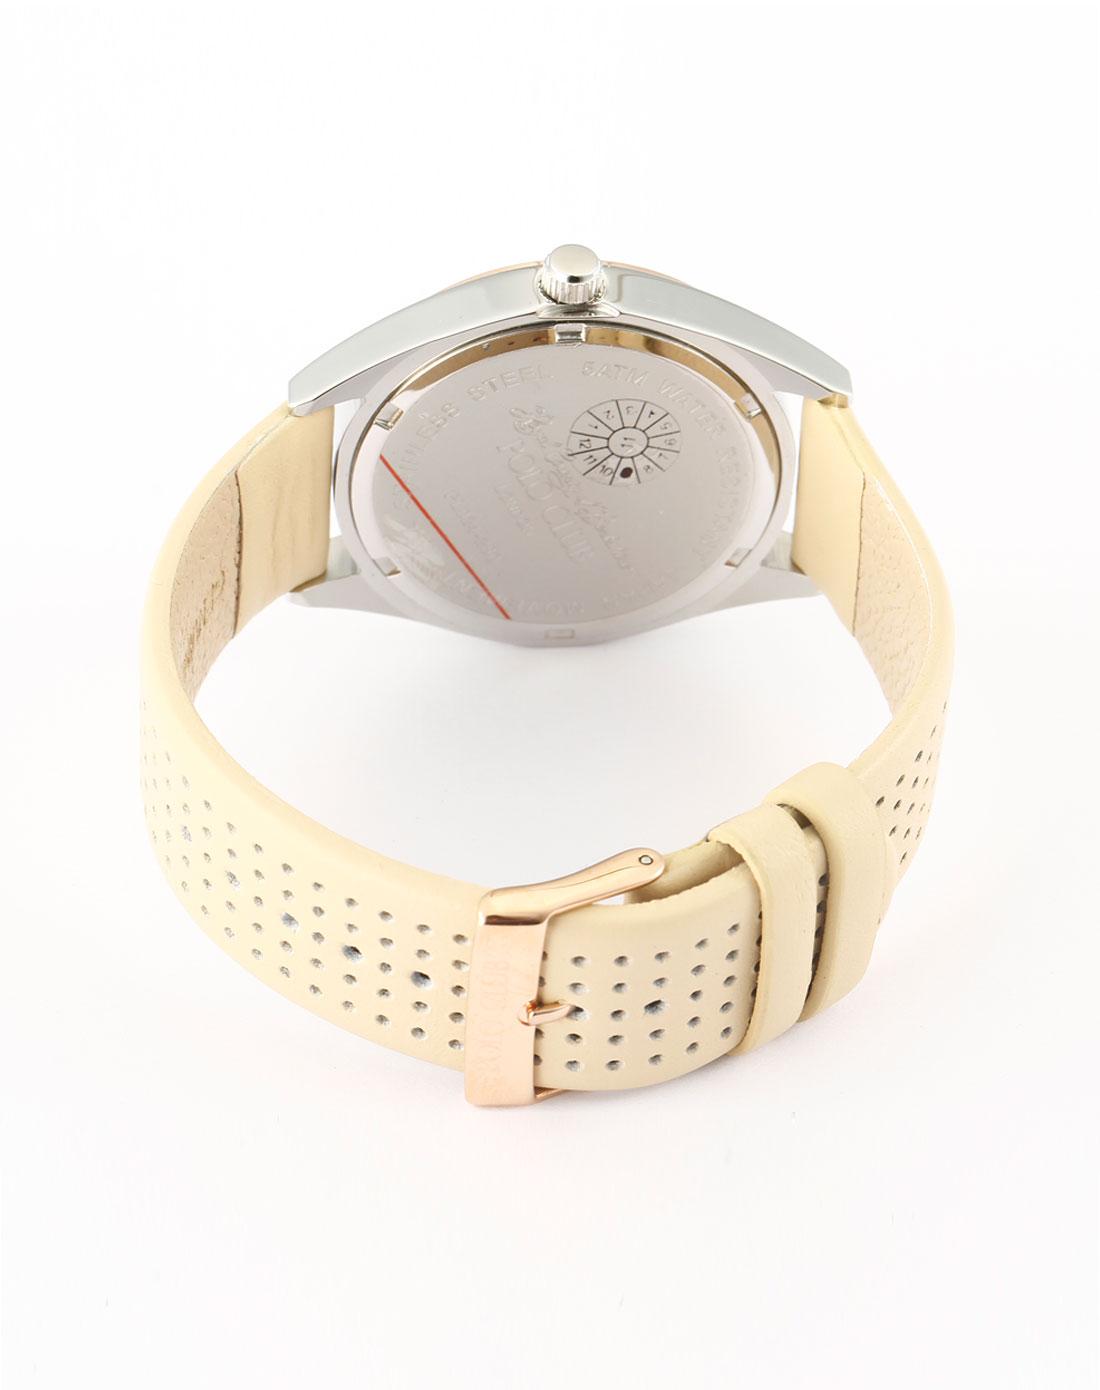 club男款玫瑰金色时尚休闲手表pl024h#-280al